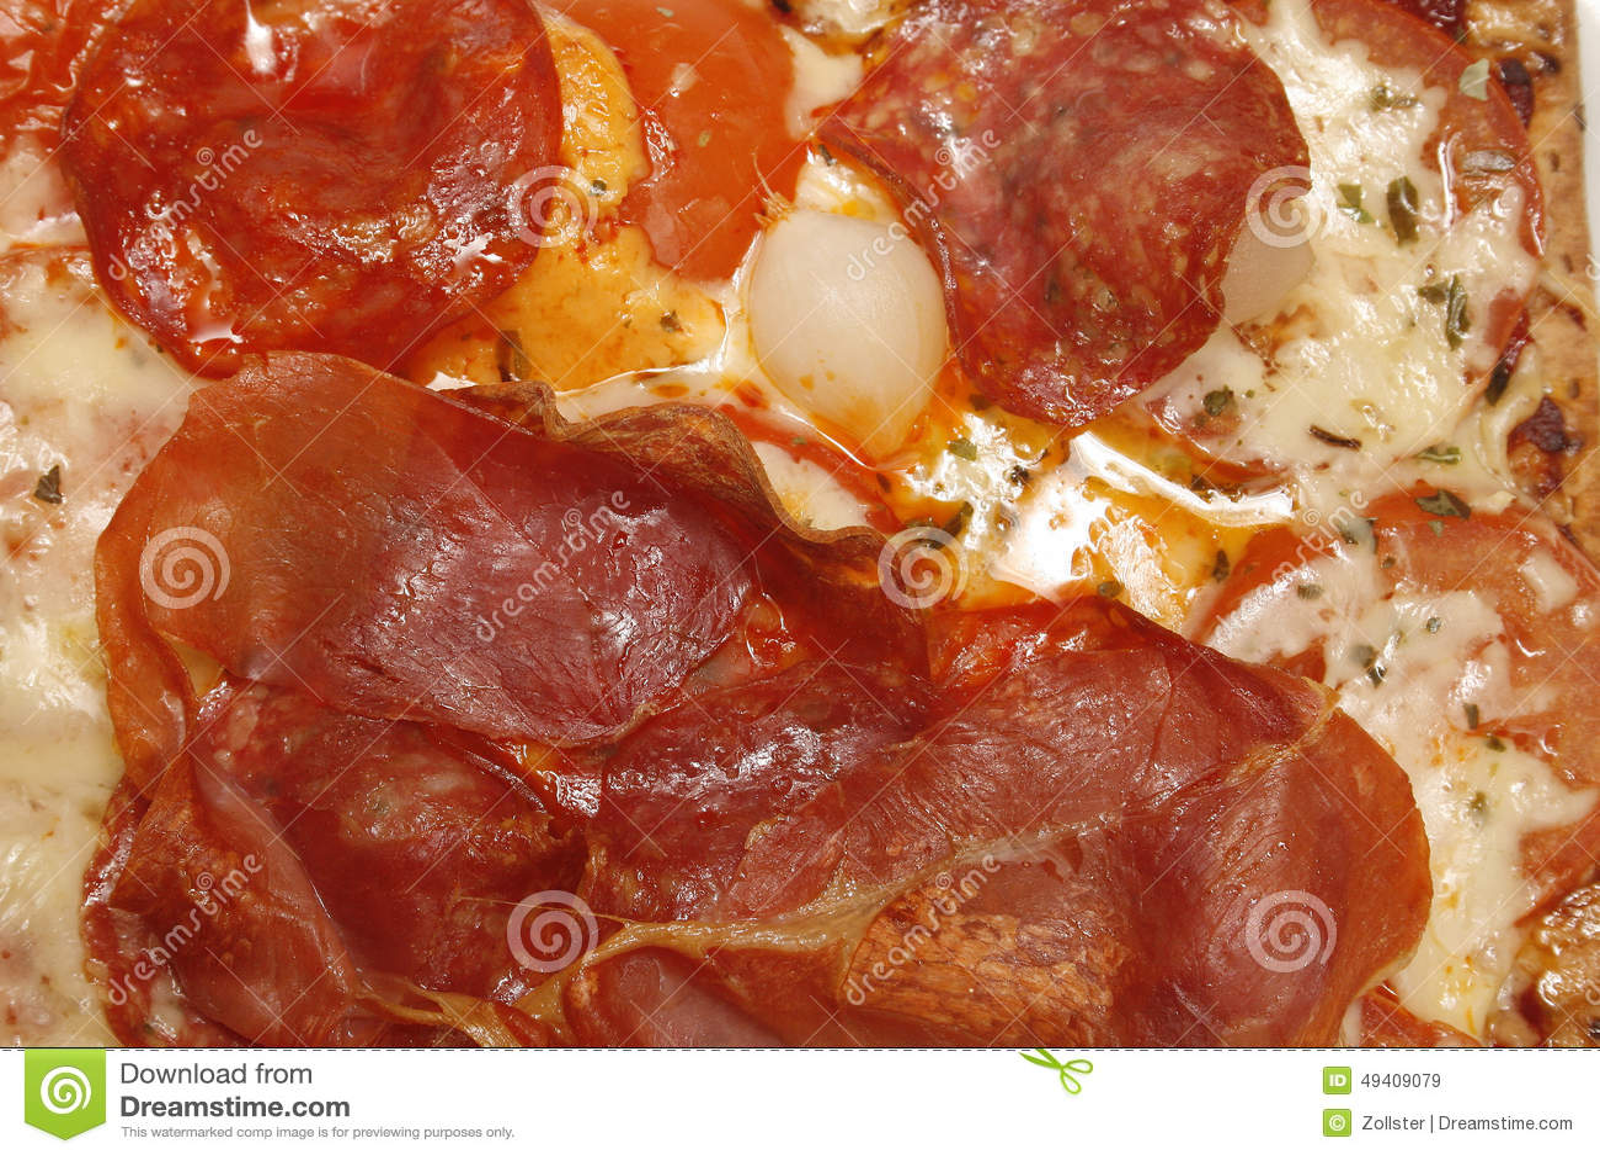 Download Pizza stockbild. Bild von kochen, teller, pepperonis - 49409079